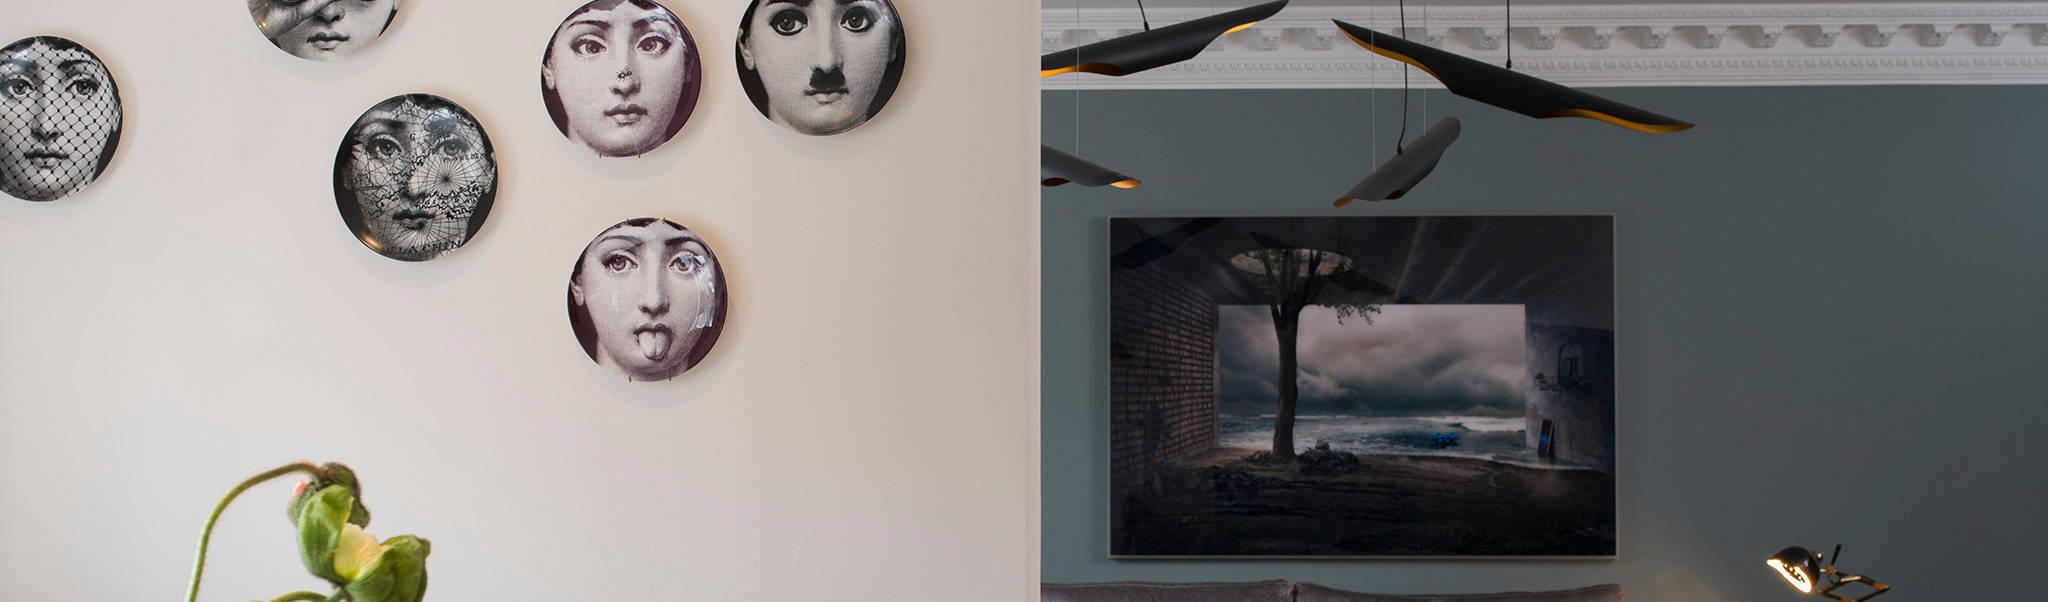 Arzu Kartal Interior Studio & Concepts